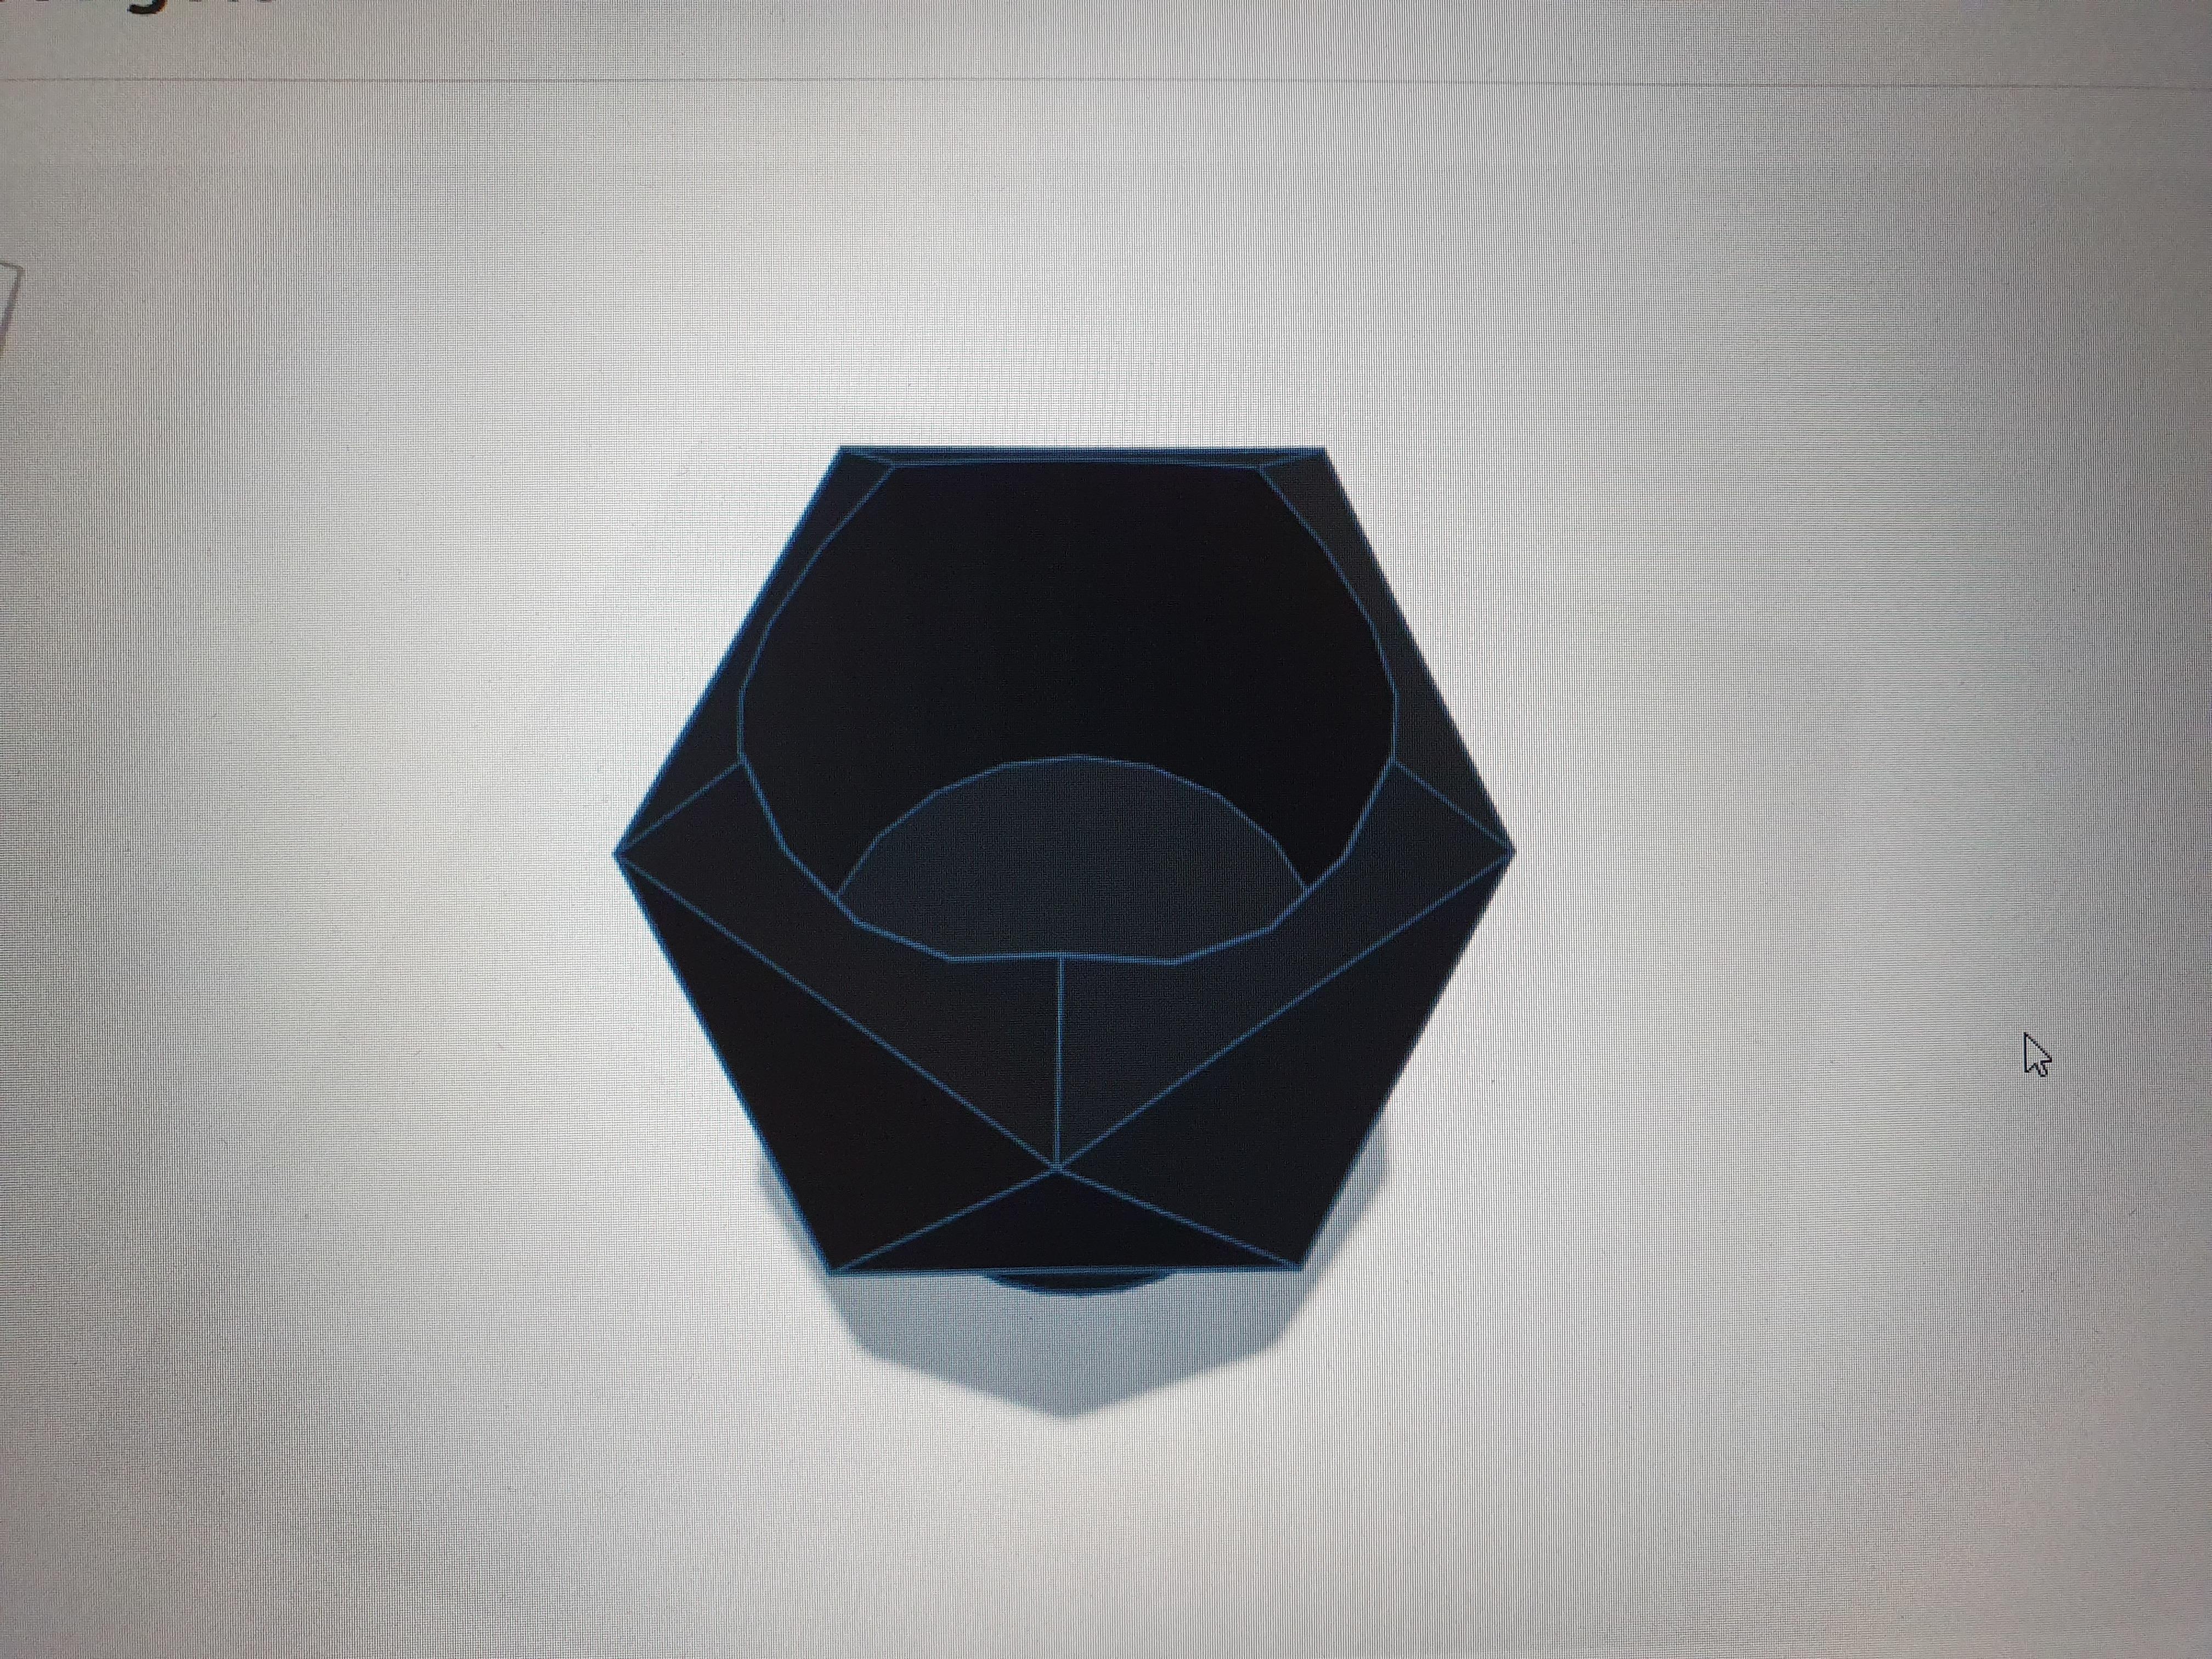 20200410_161013.jpg Download free STL file Design pencil pot/PENCIL BOX/ NEW/DESIGN/FUTURE • Object to 3D print, Mathias_Cst07